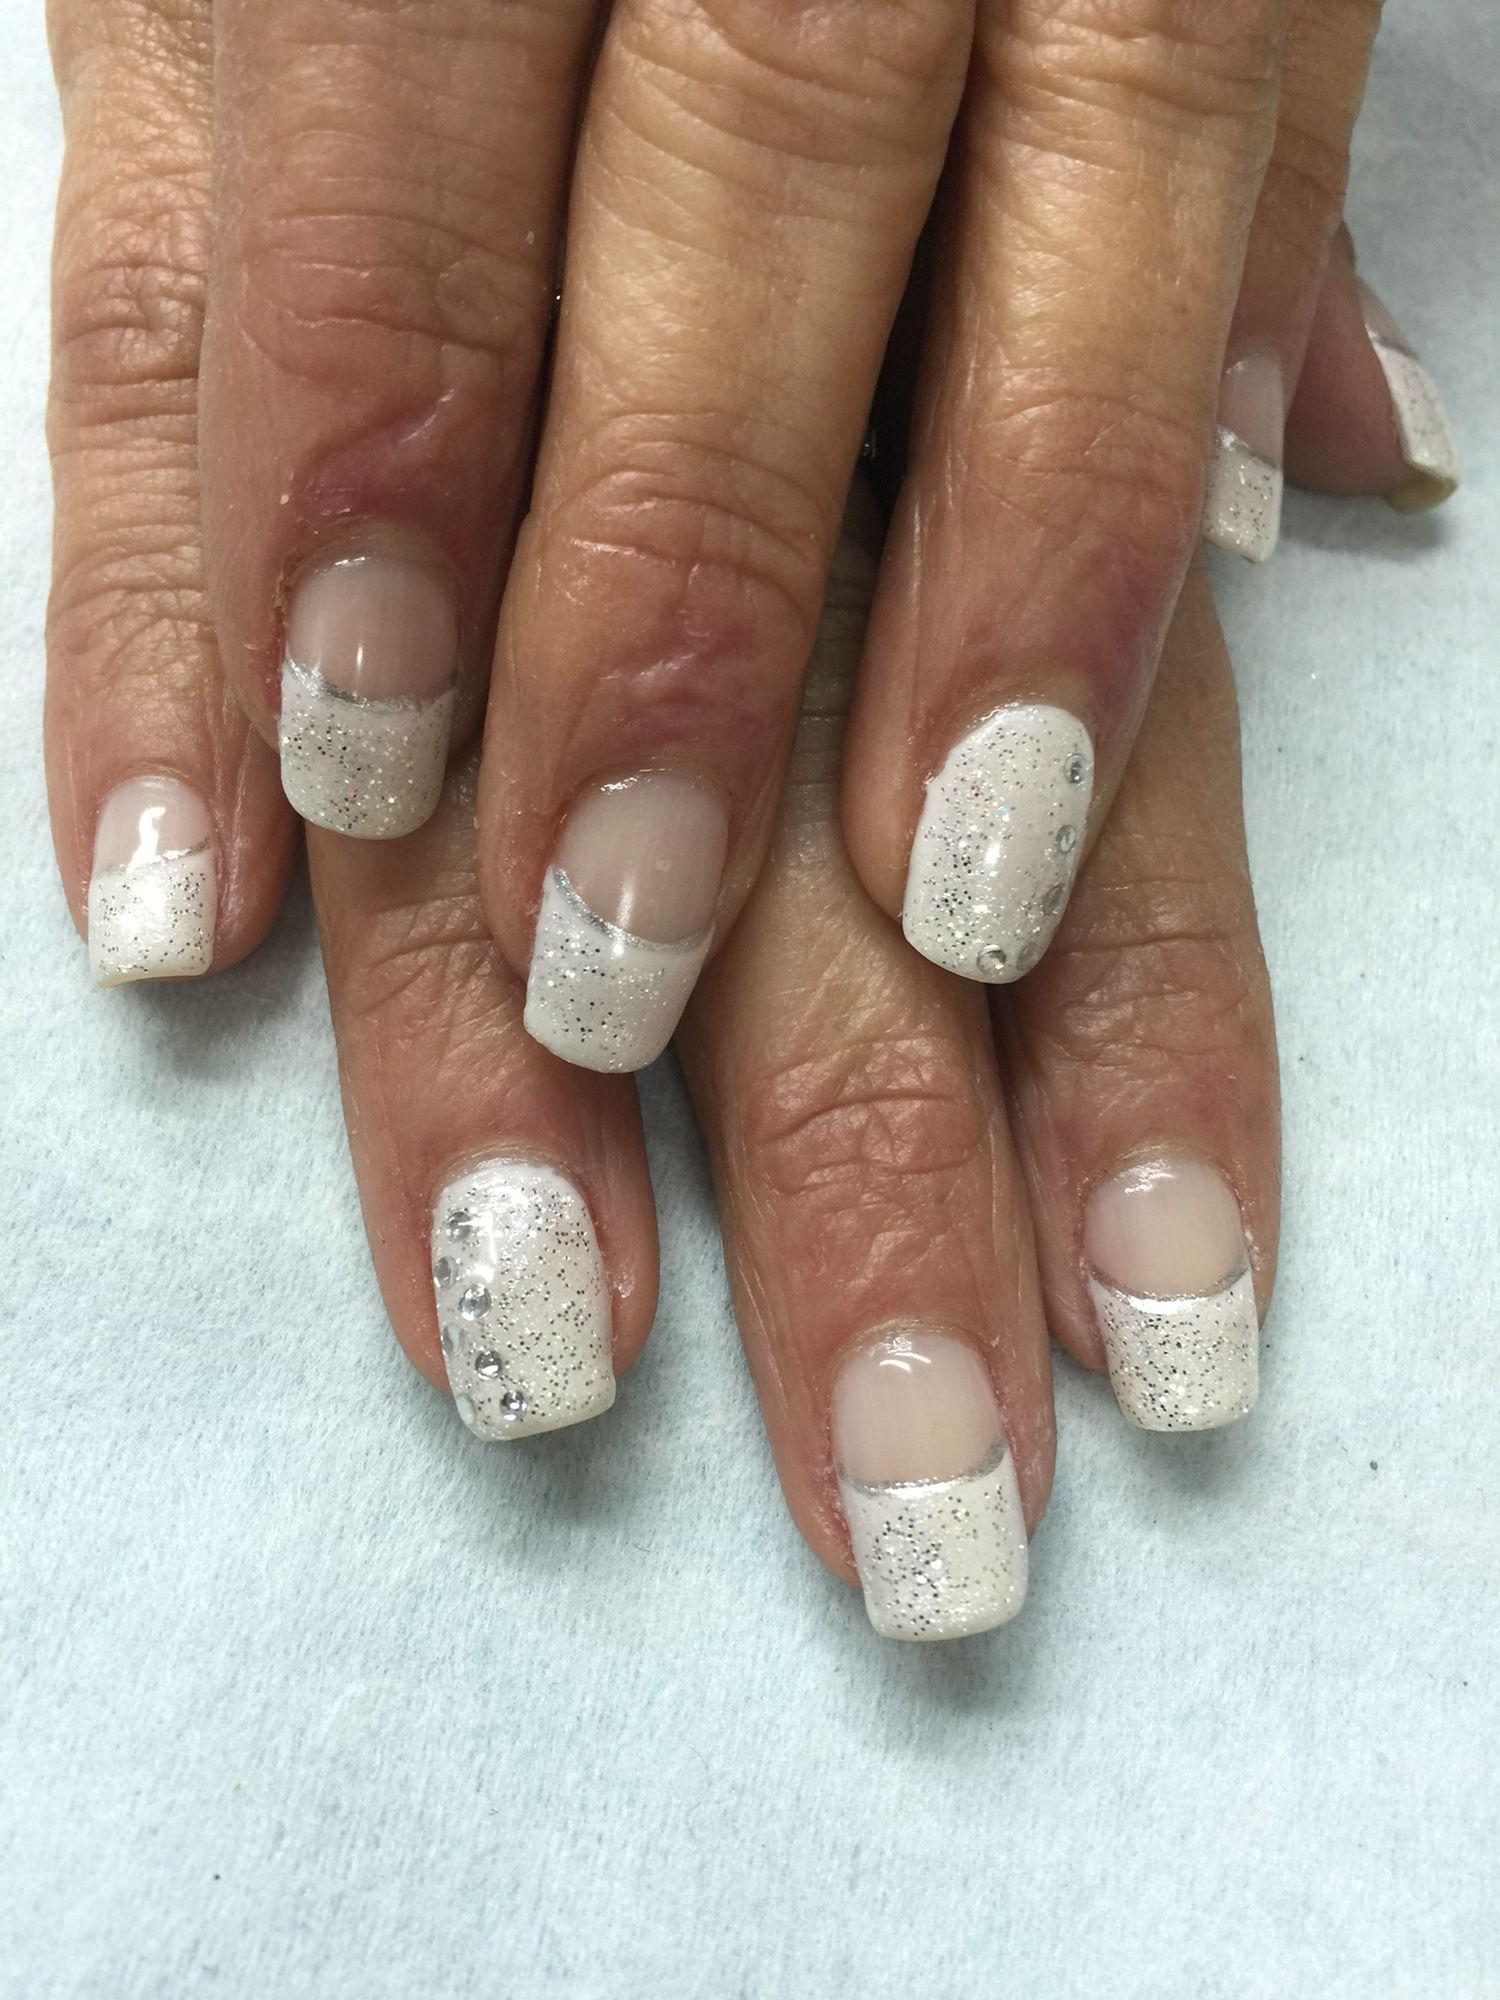 Sparkled Glitter & Rhinestones Big White French Gel polish over non ...